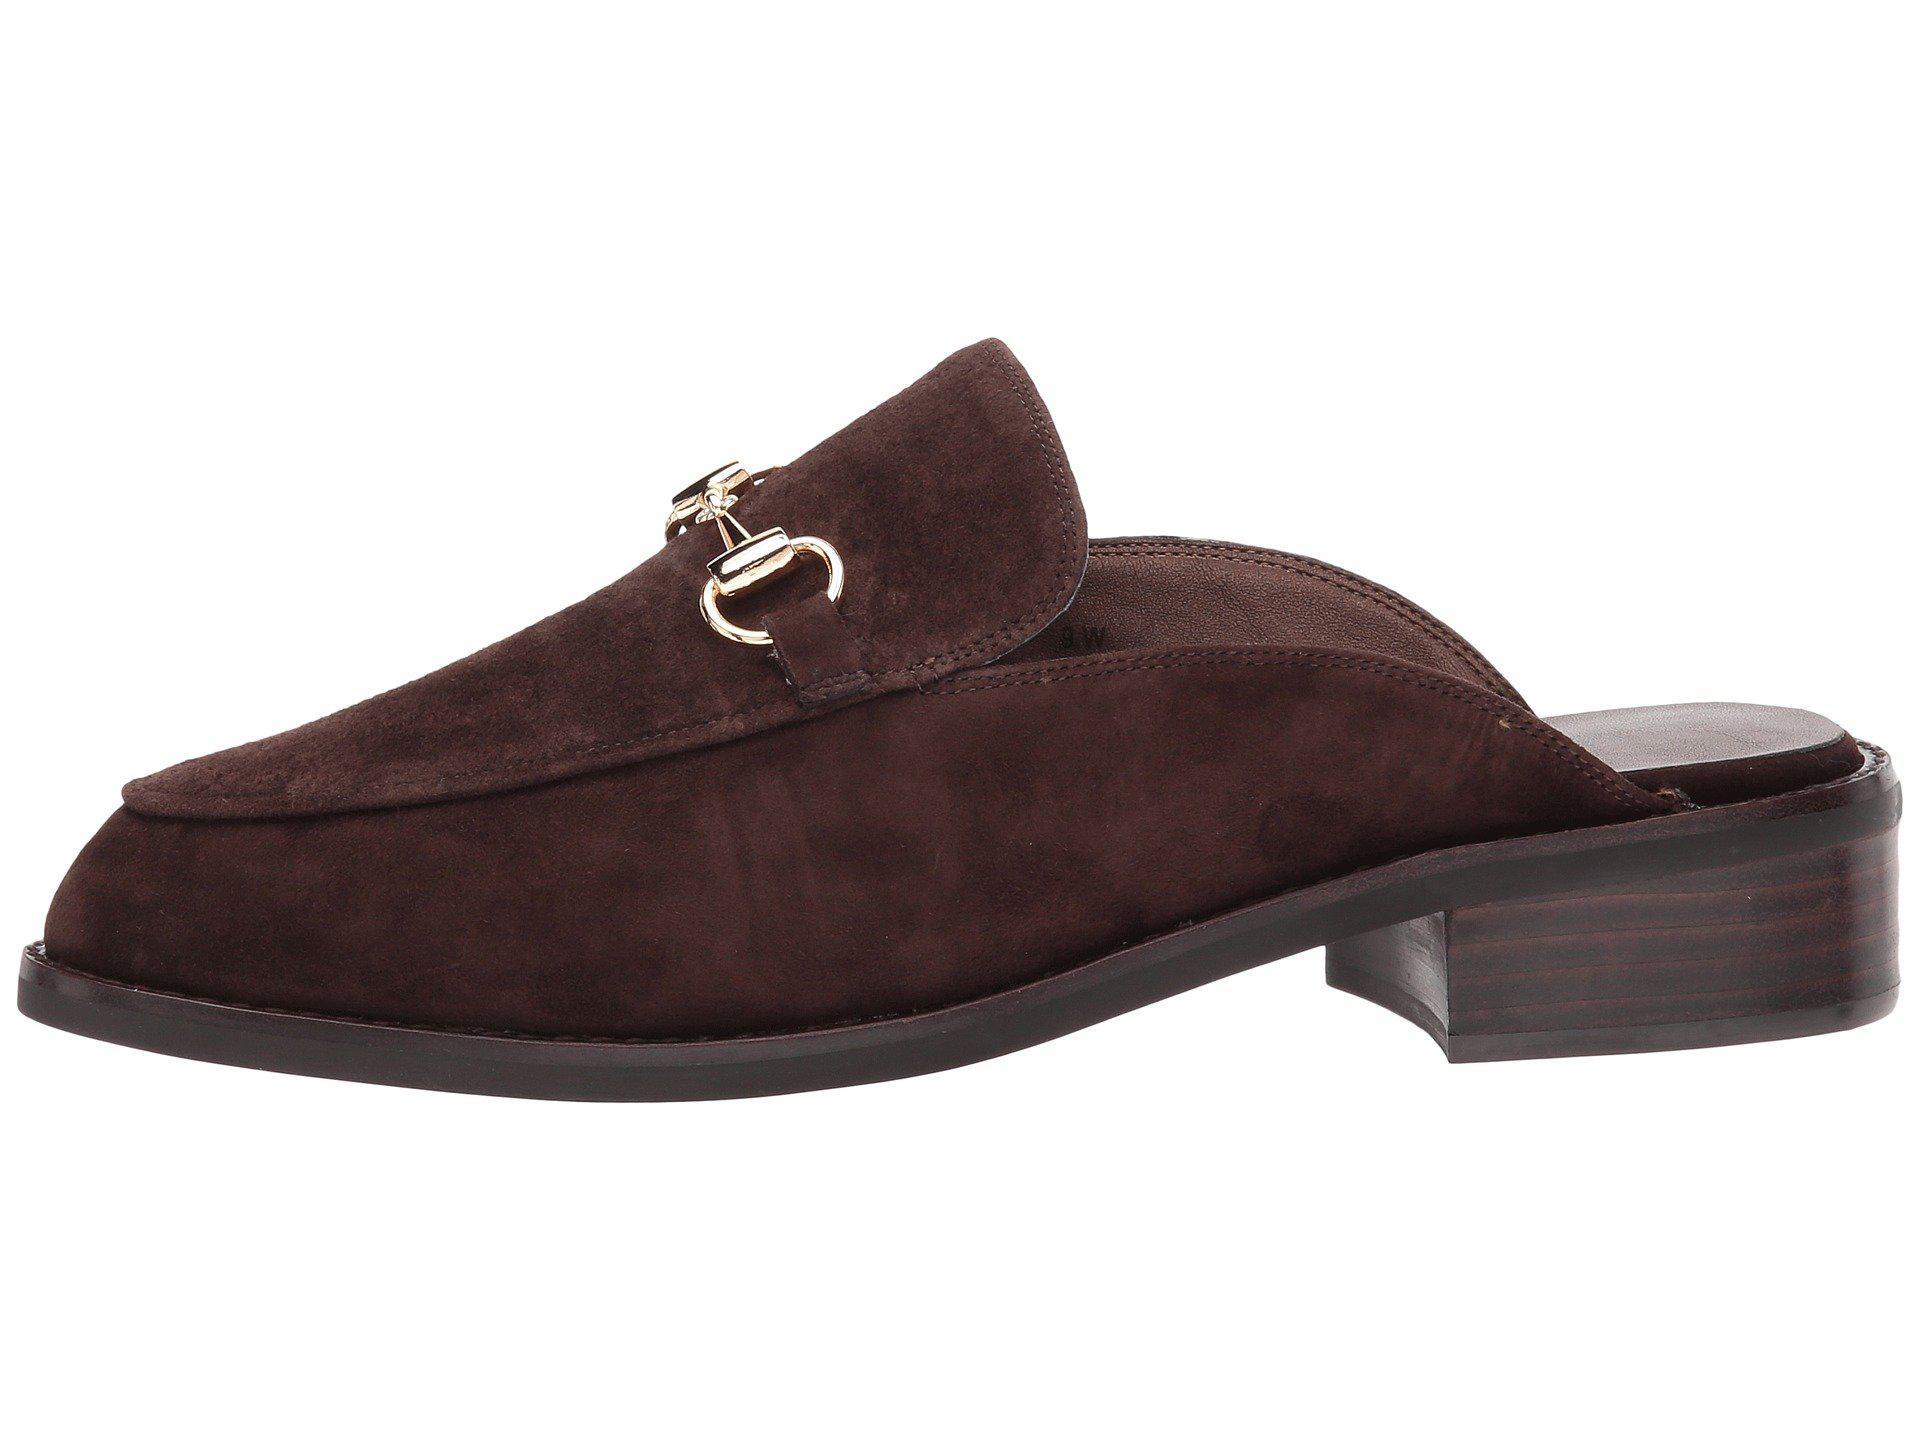 Vaneli Akela Tmoro Suede Gold Trim Women S Slip On Shoes